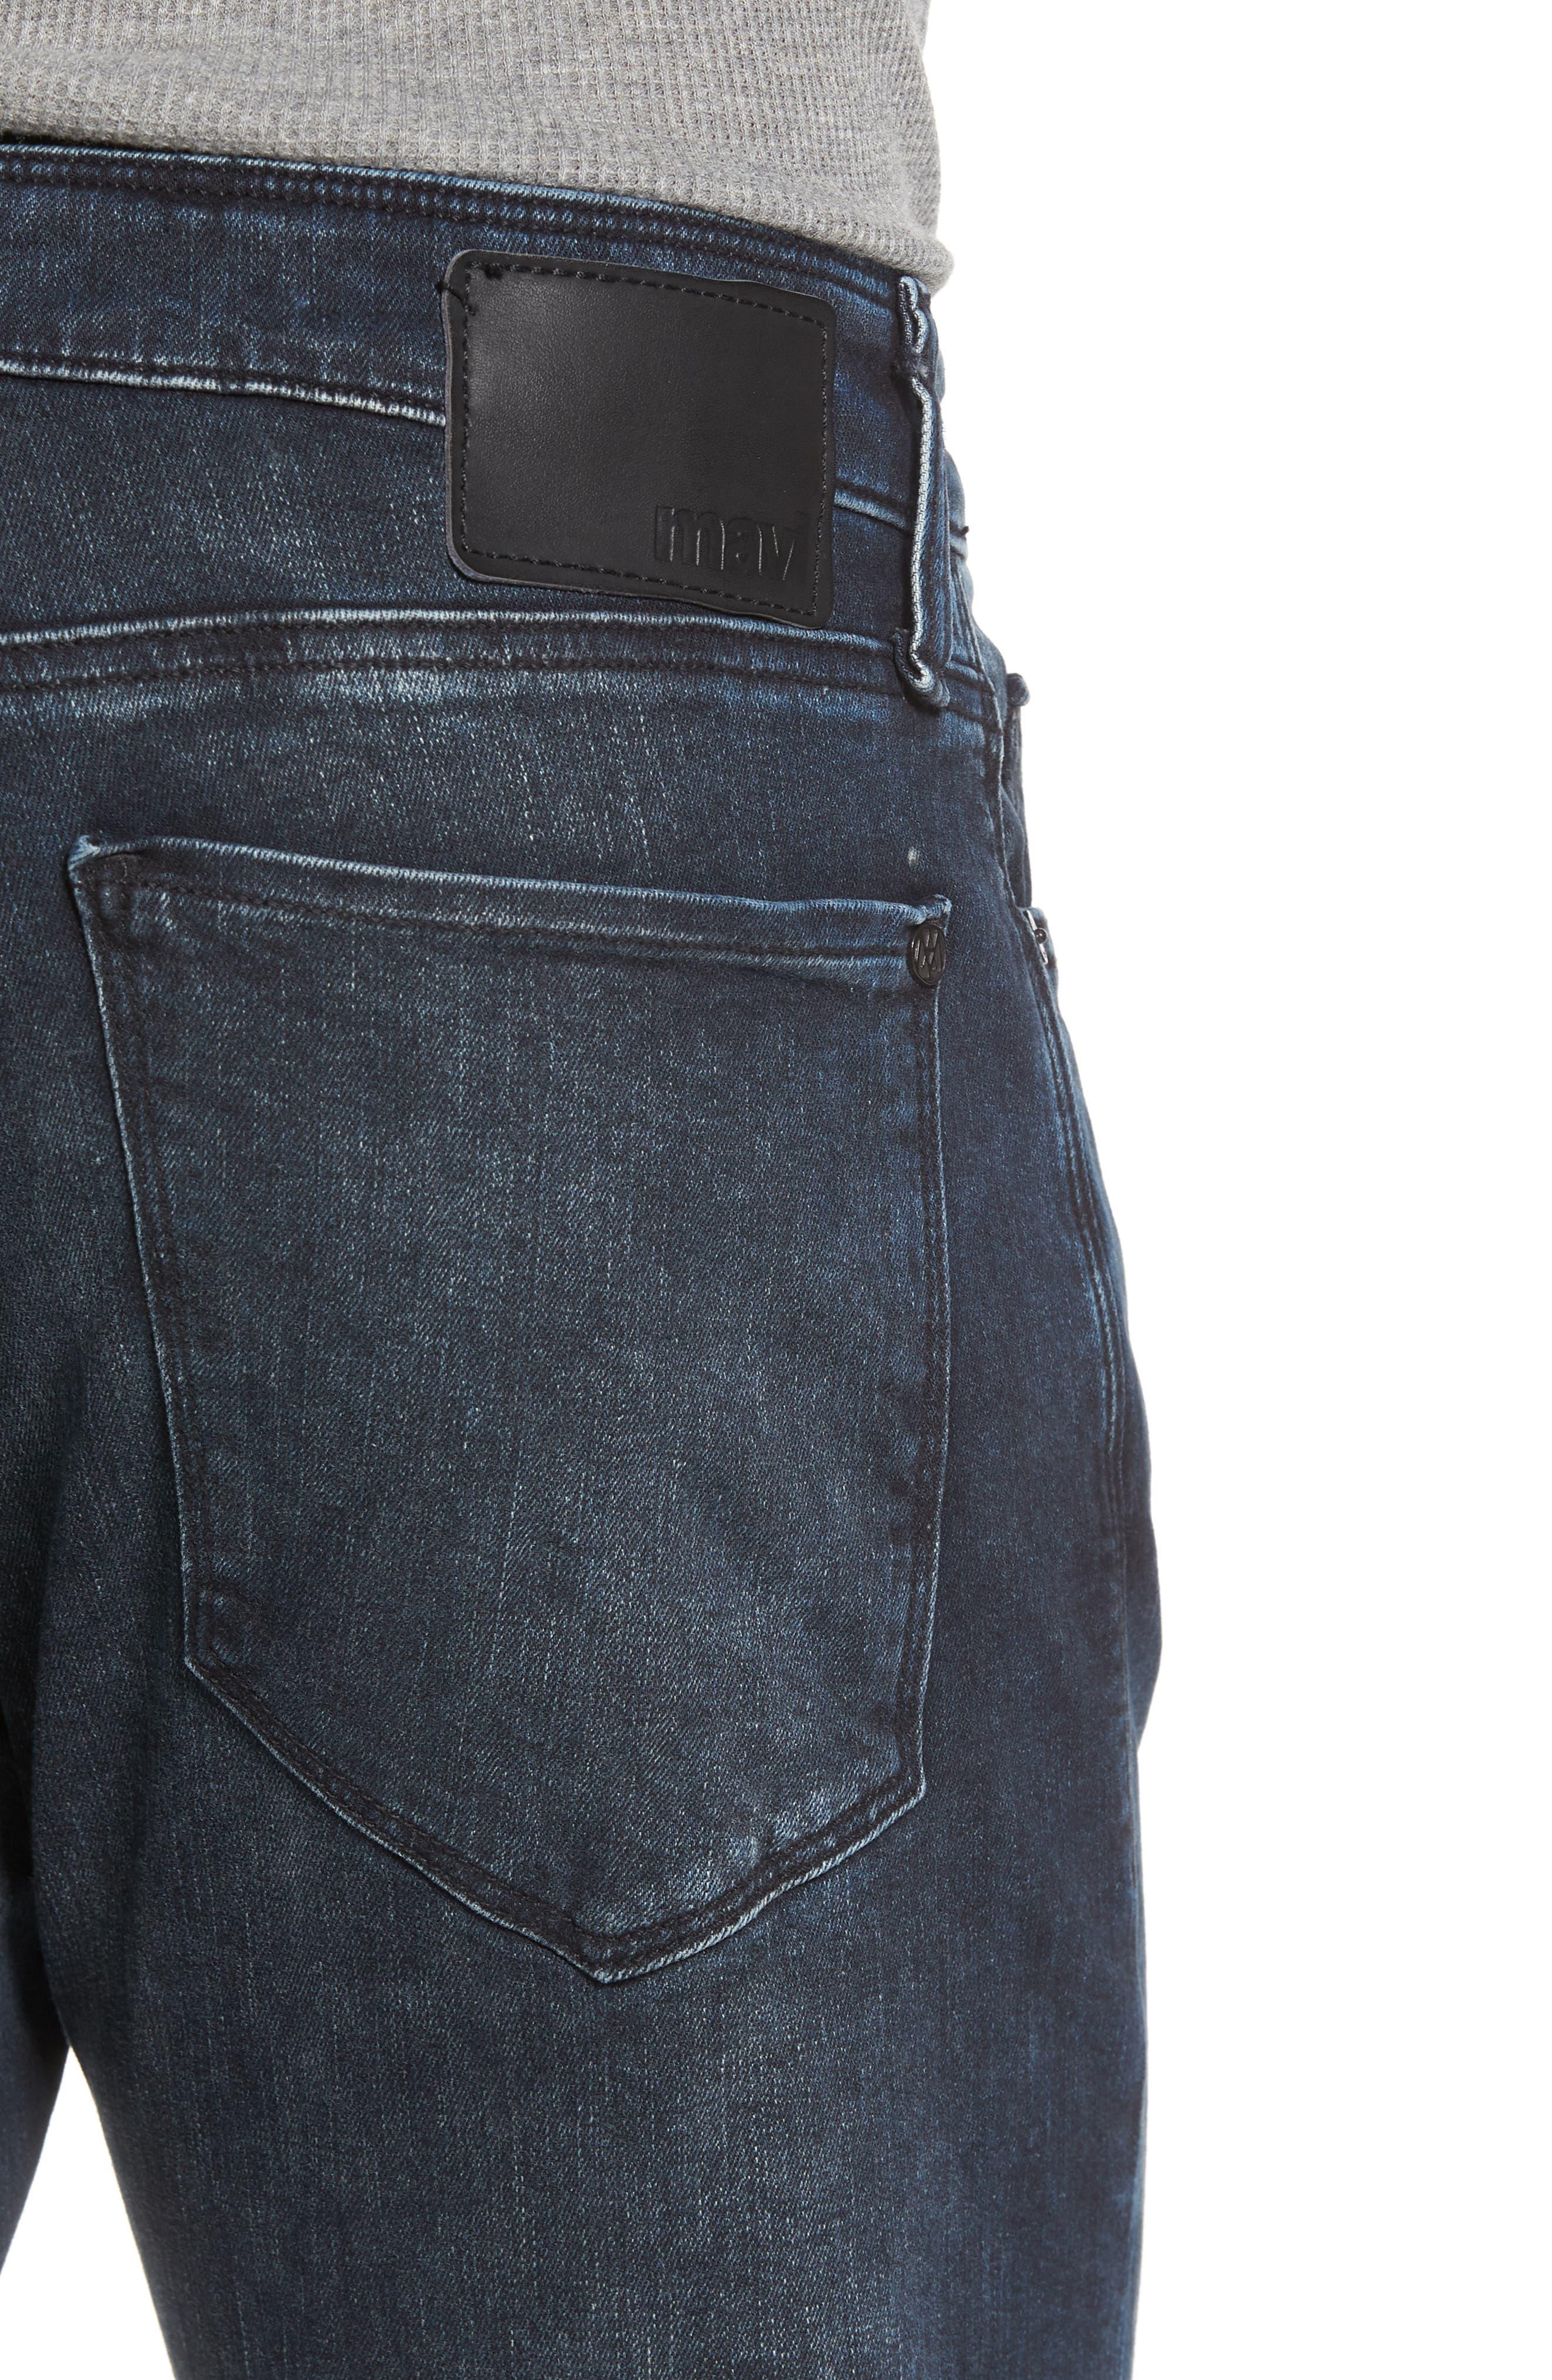 Jake Slim Fit Jeans,                             Alternate thumbnail 4, color,                             401